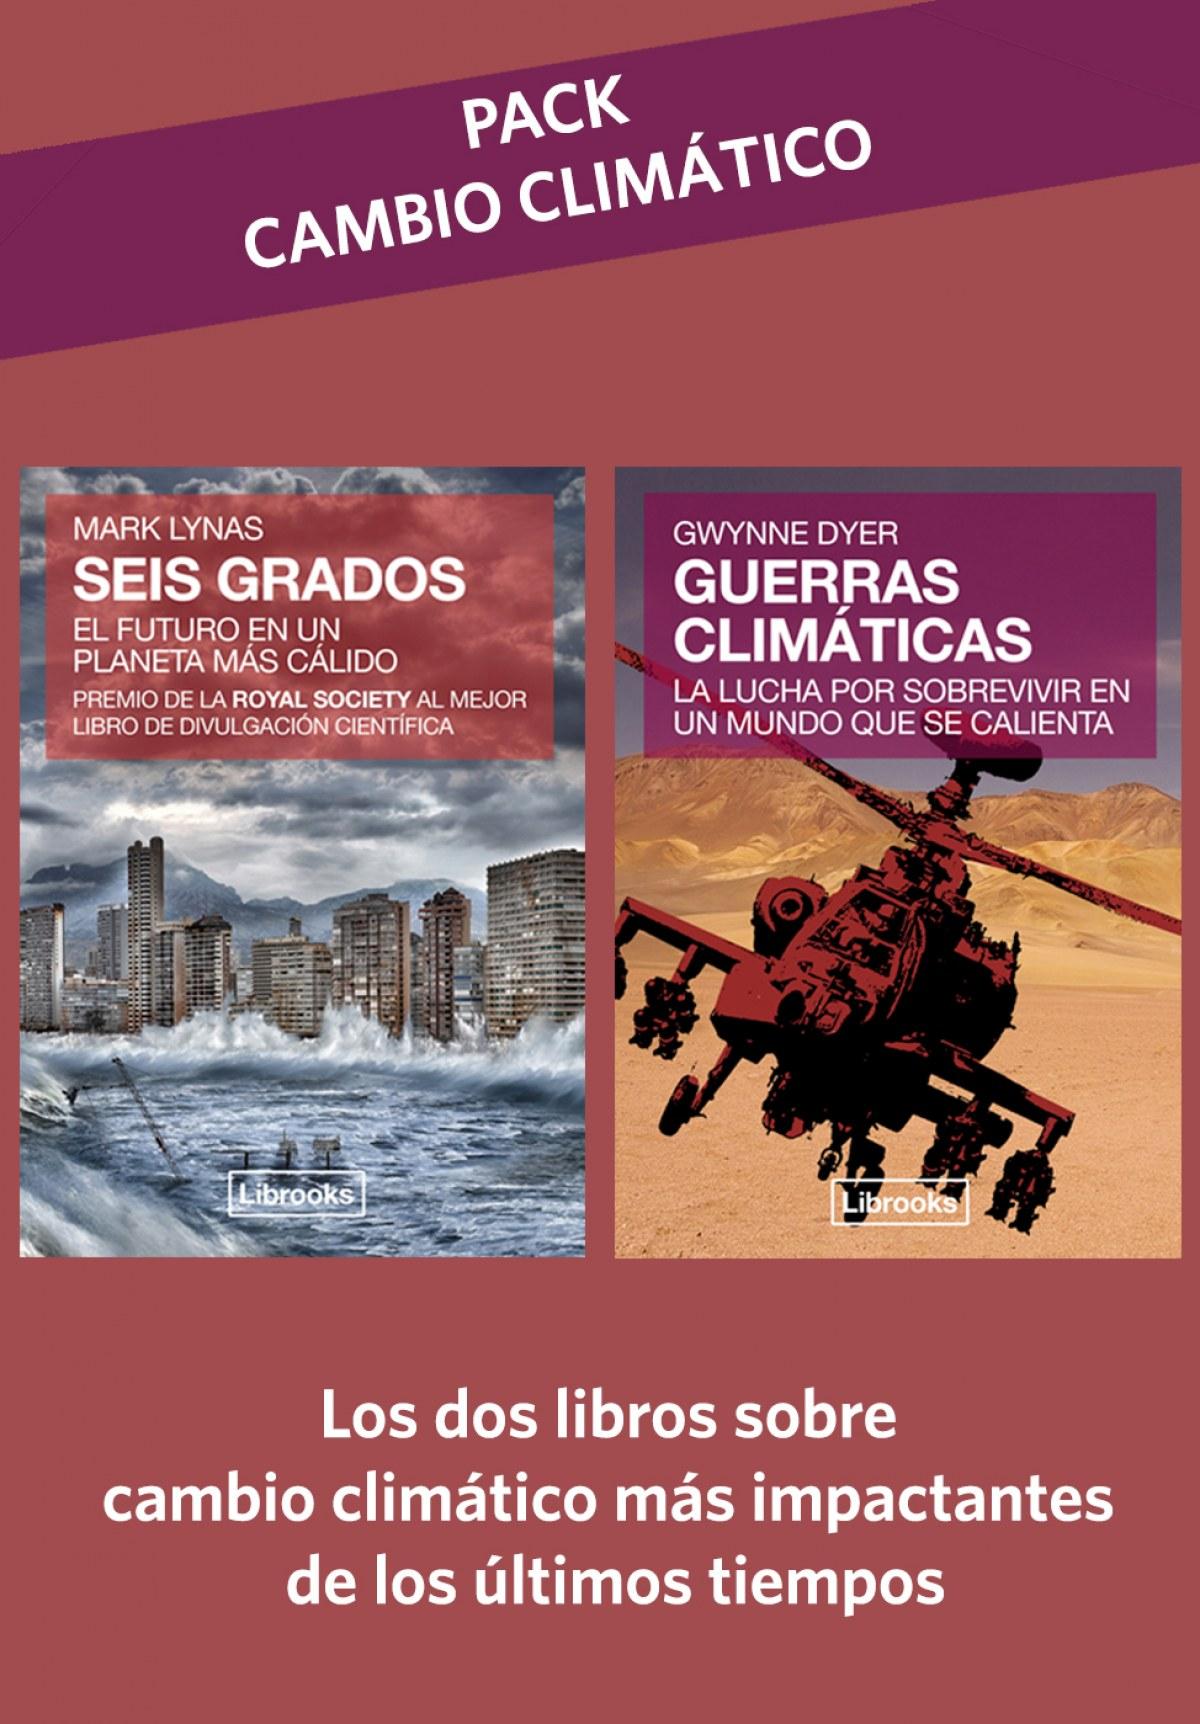 PACK CAMBIO CLIMÁTICO: SEIS GRADOS + GUERRAS CLIMáTICAS